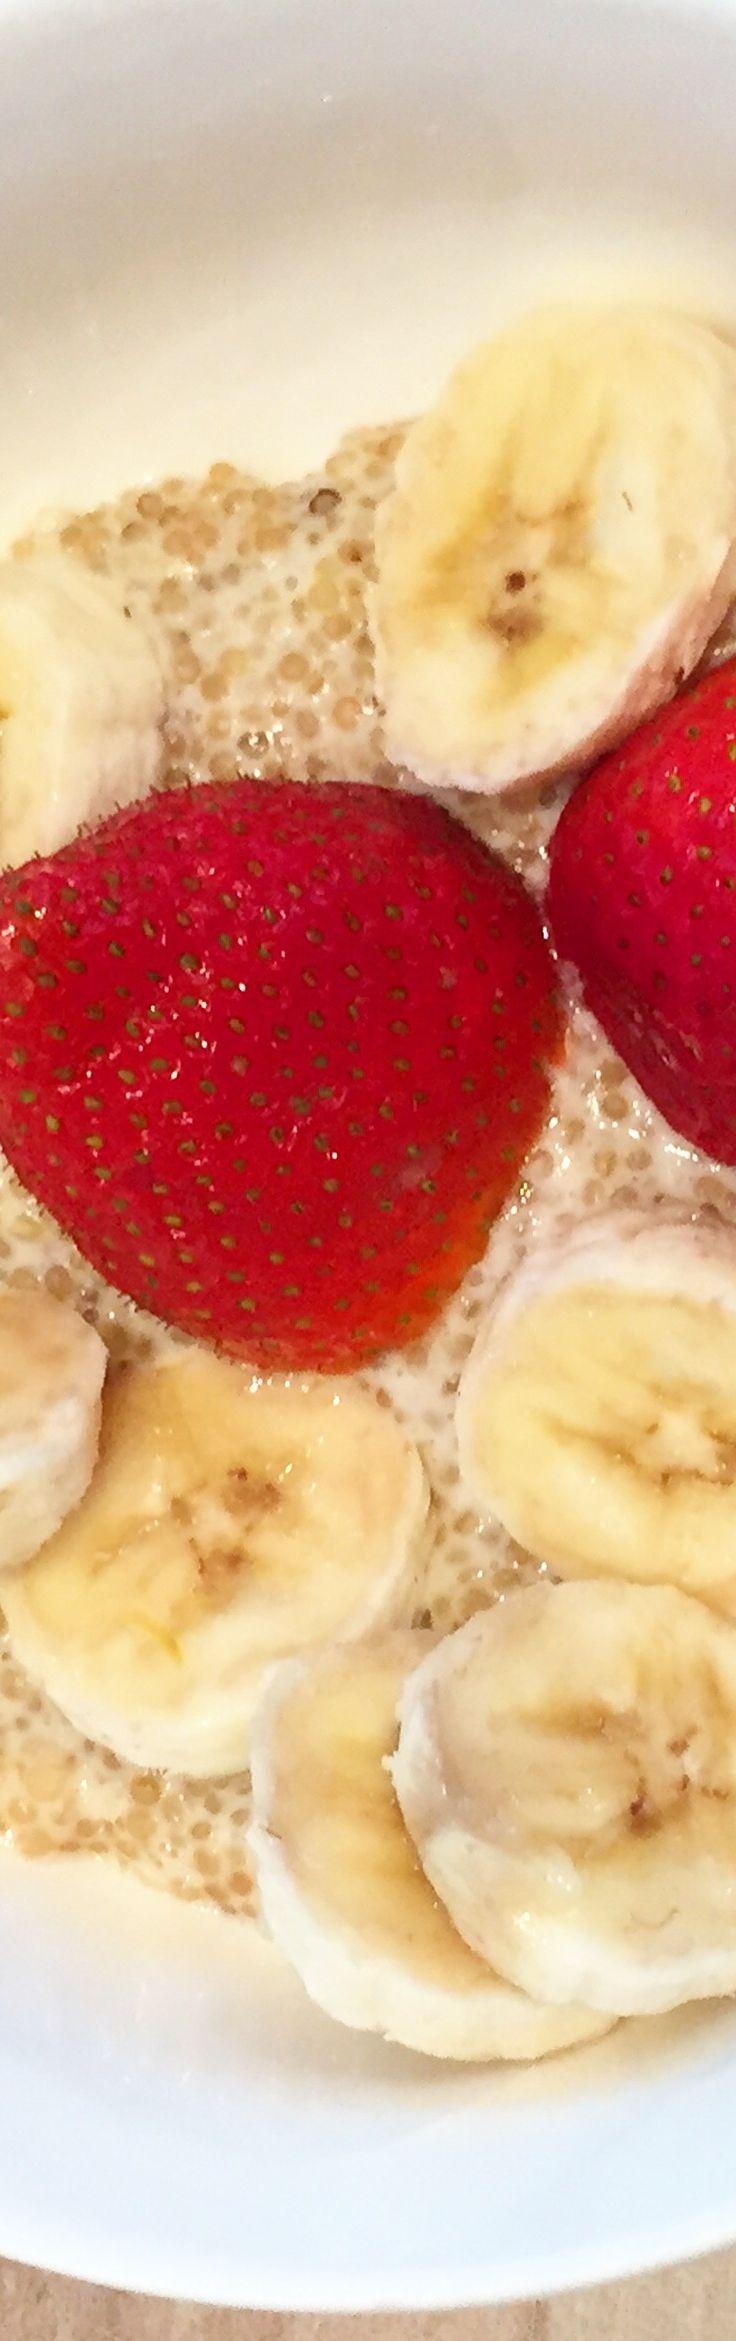 Quinoa Milchreis mit Bananen - (Fitness Food Breakfast)